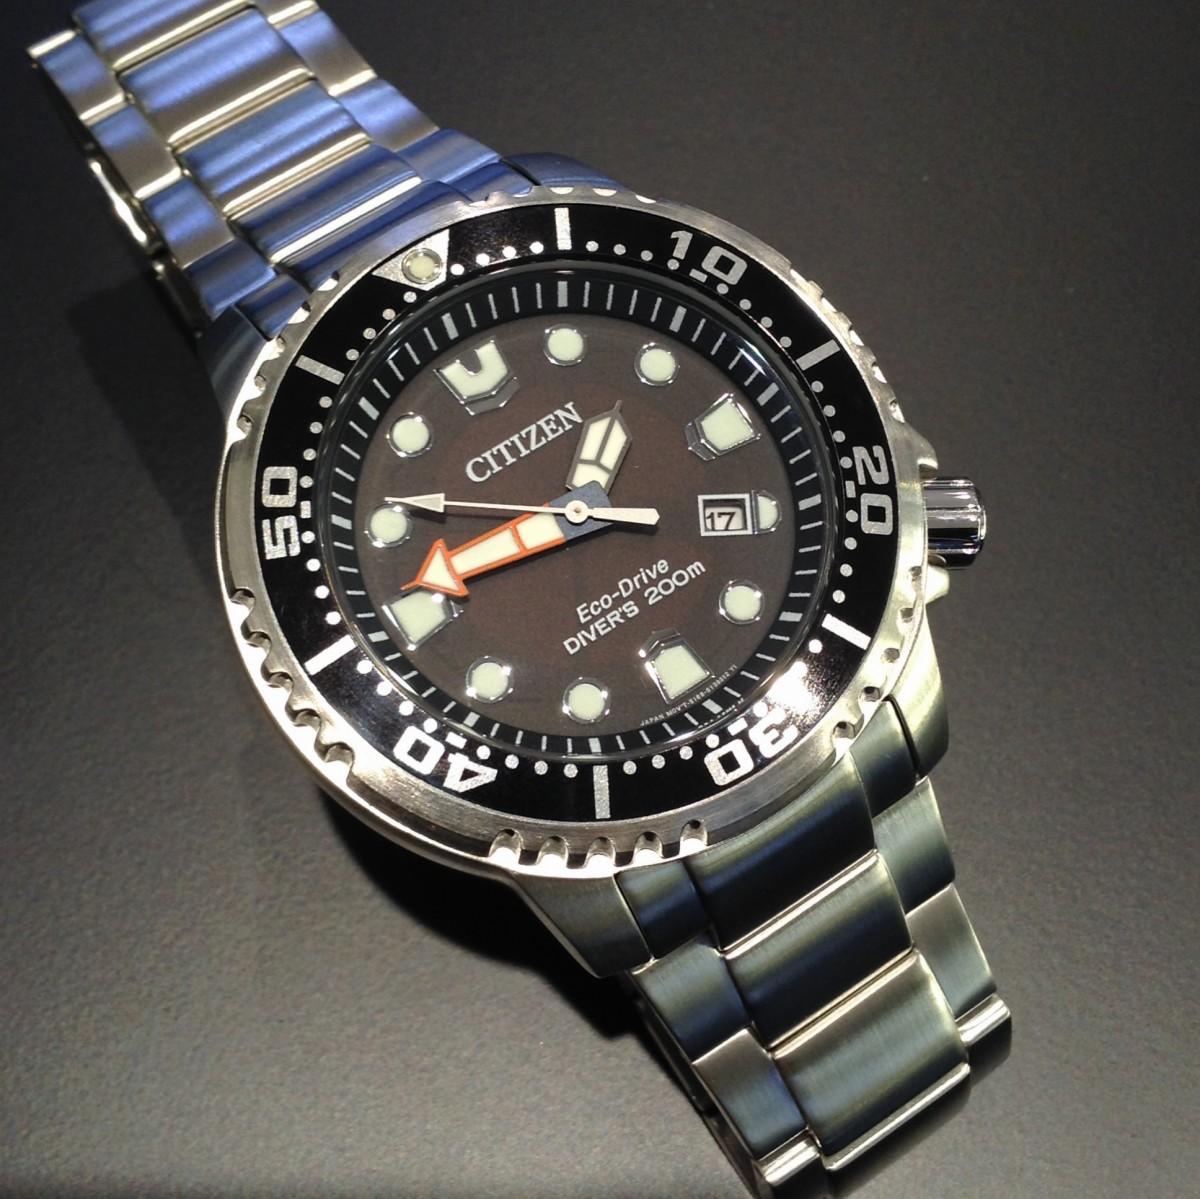 Citizen promaster dive watch crown jewellery - Citizen promaster dive watch ...